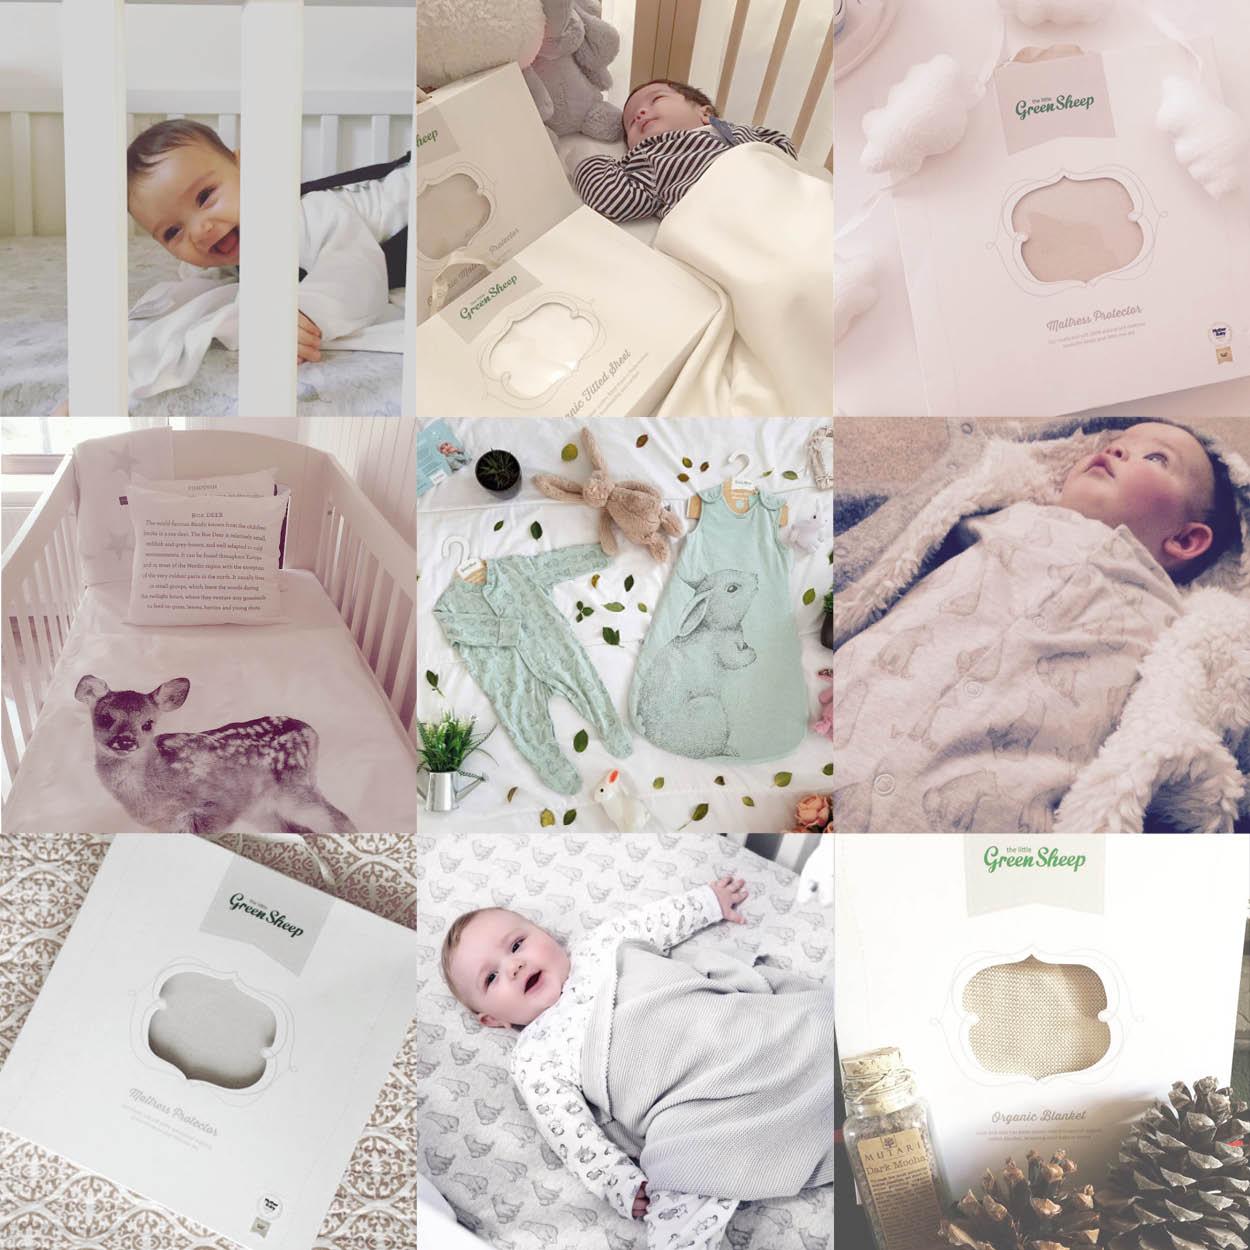 Baby crib for sale redditch - Follow Us